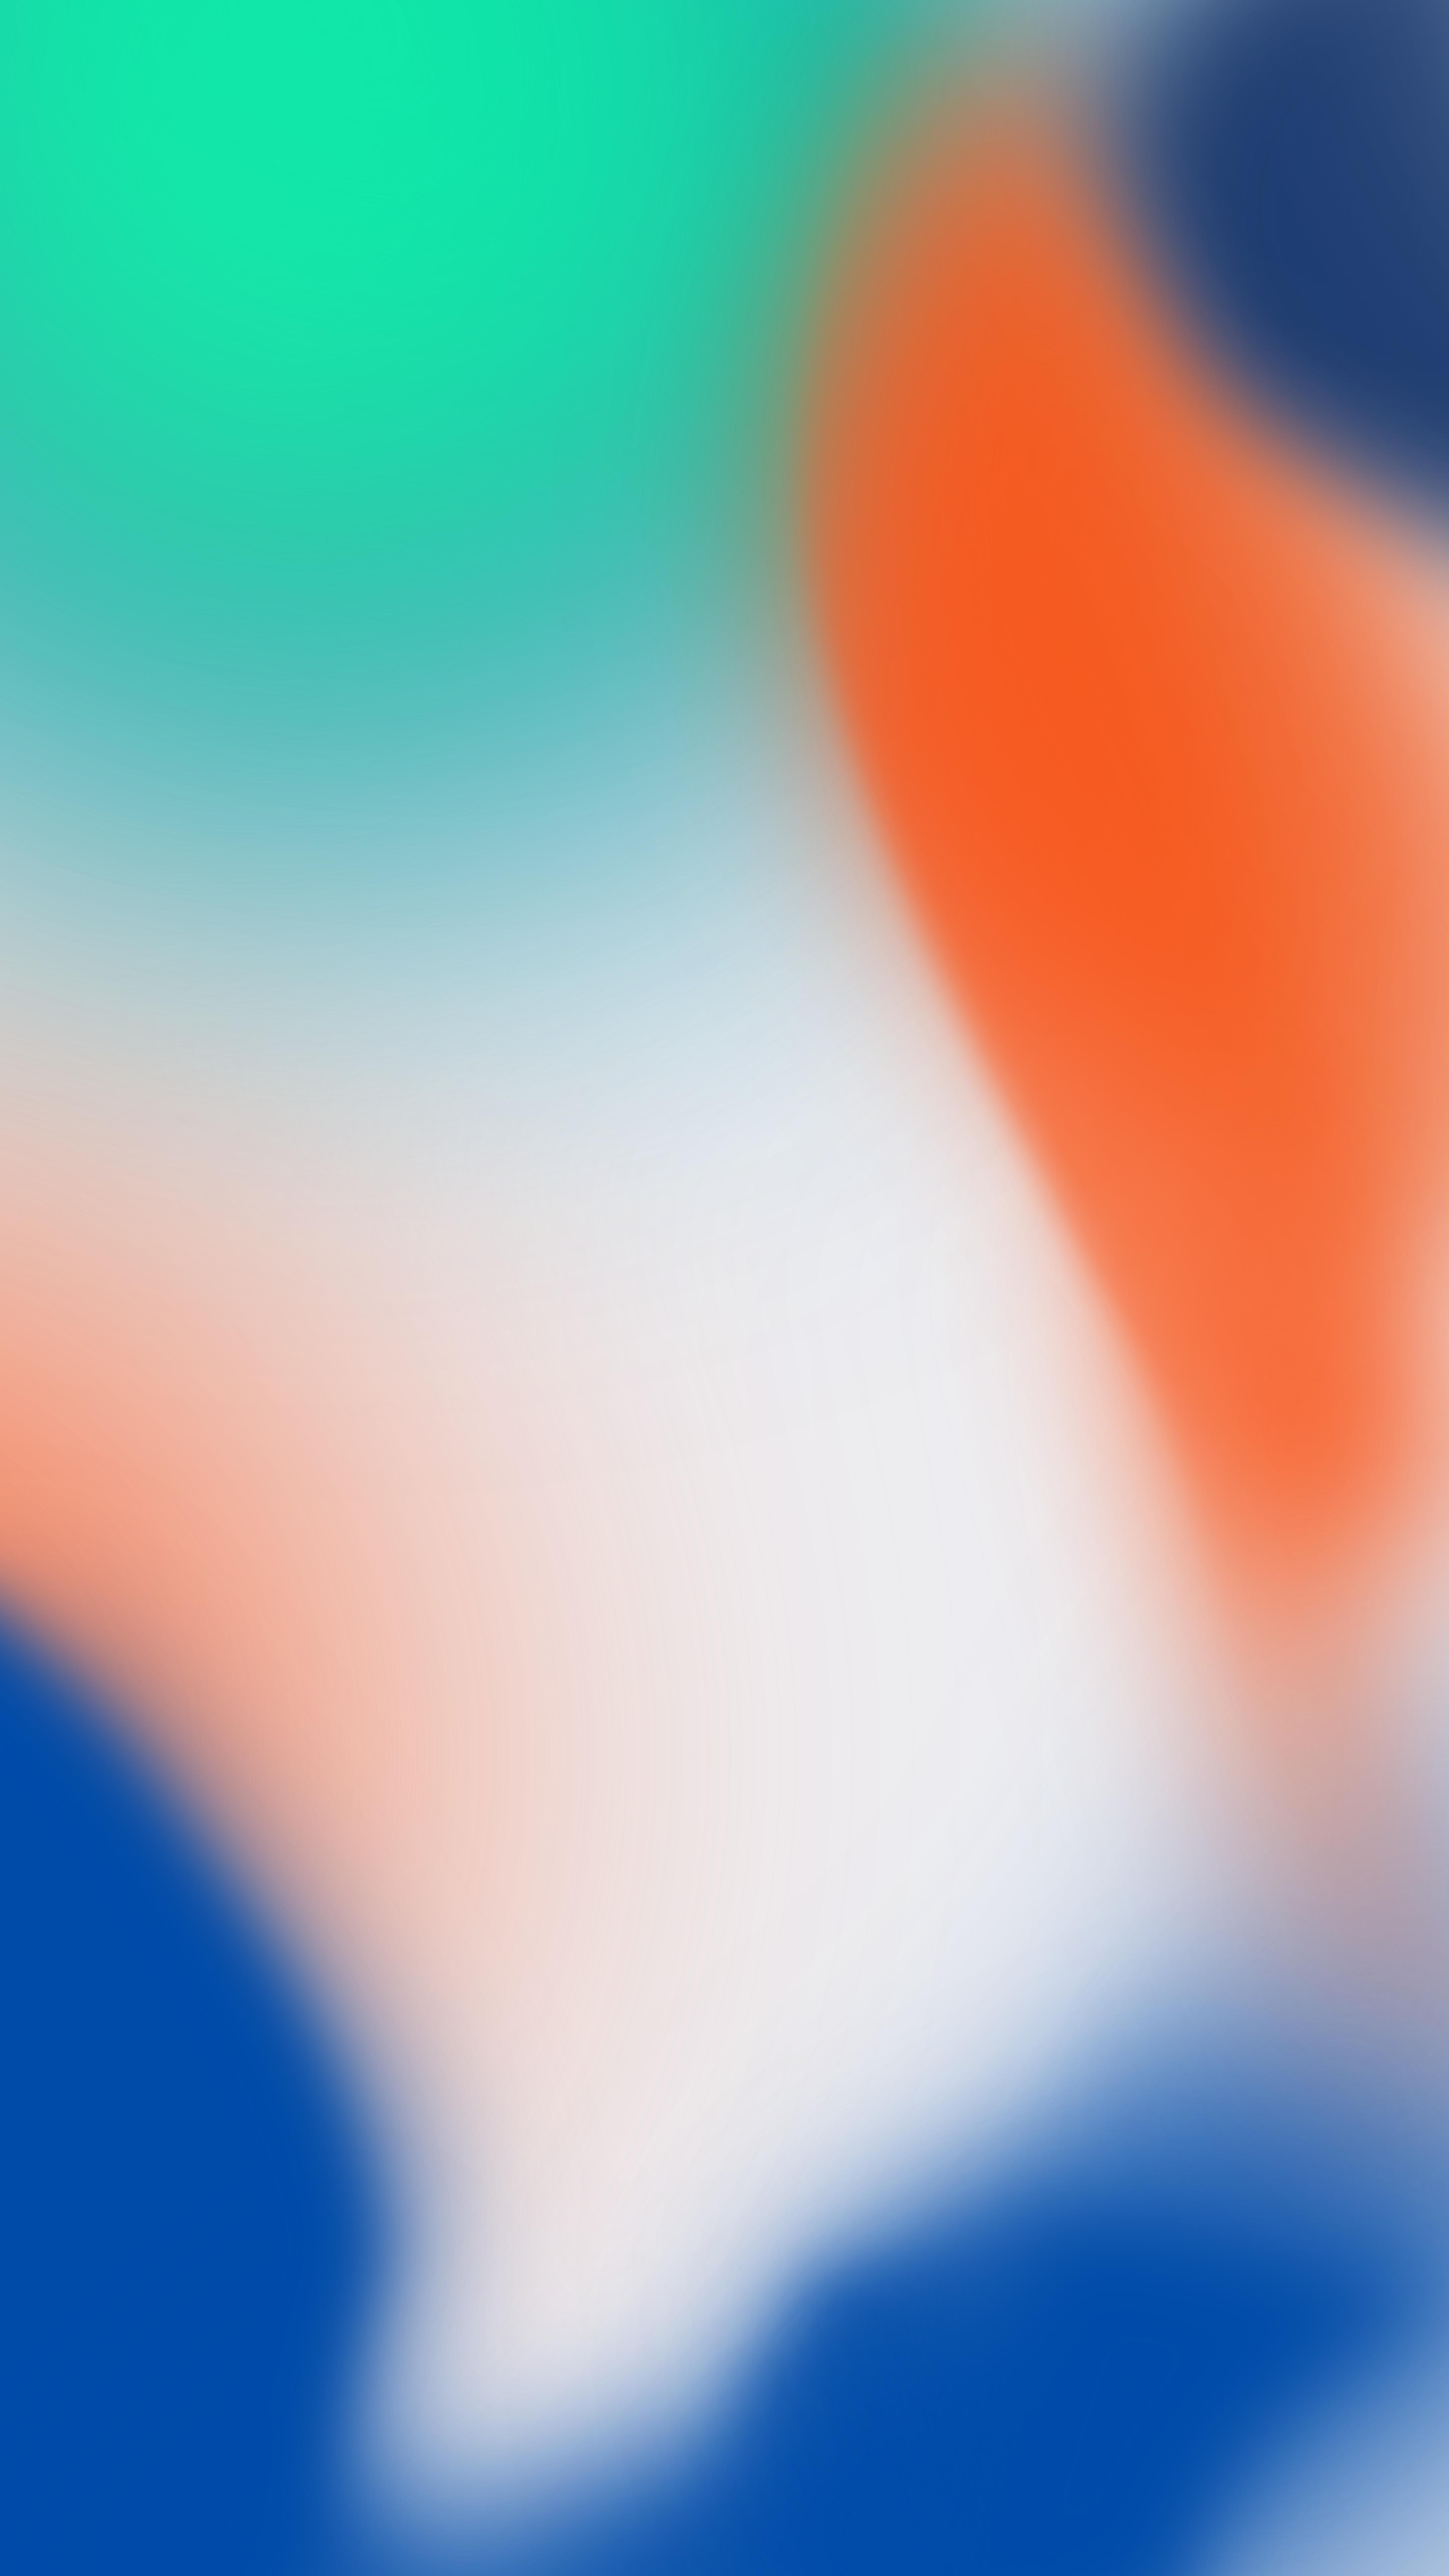 iPhone-X-Presentation-Wallpaper